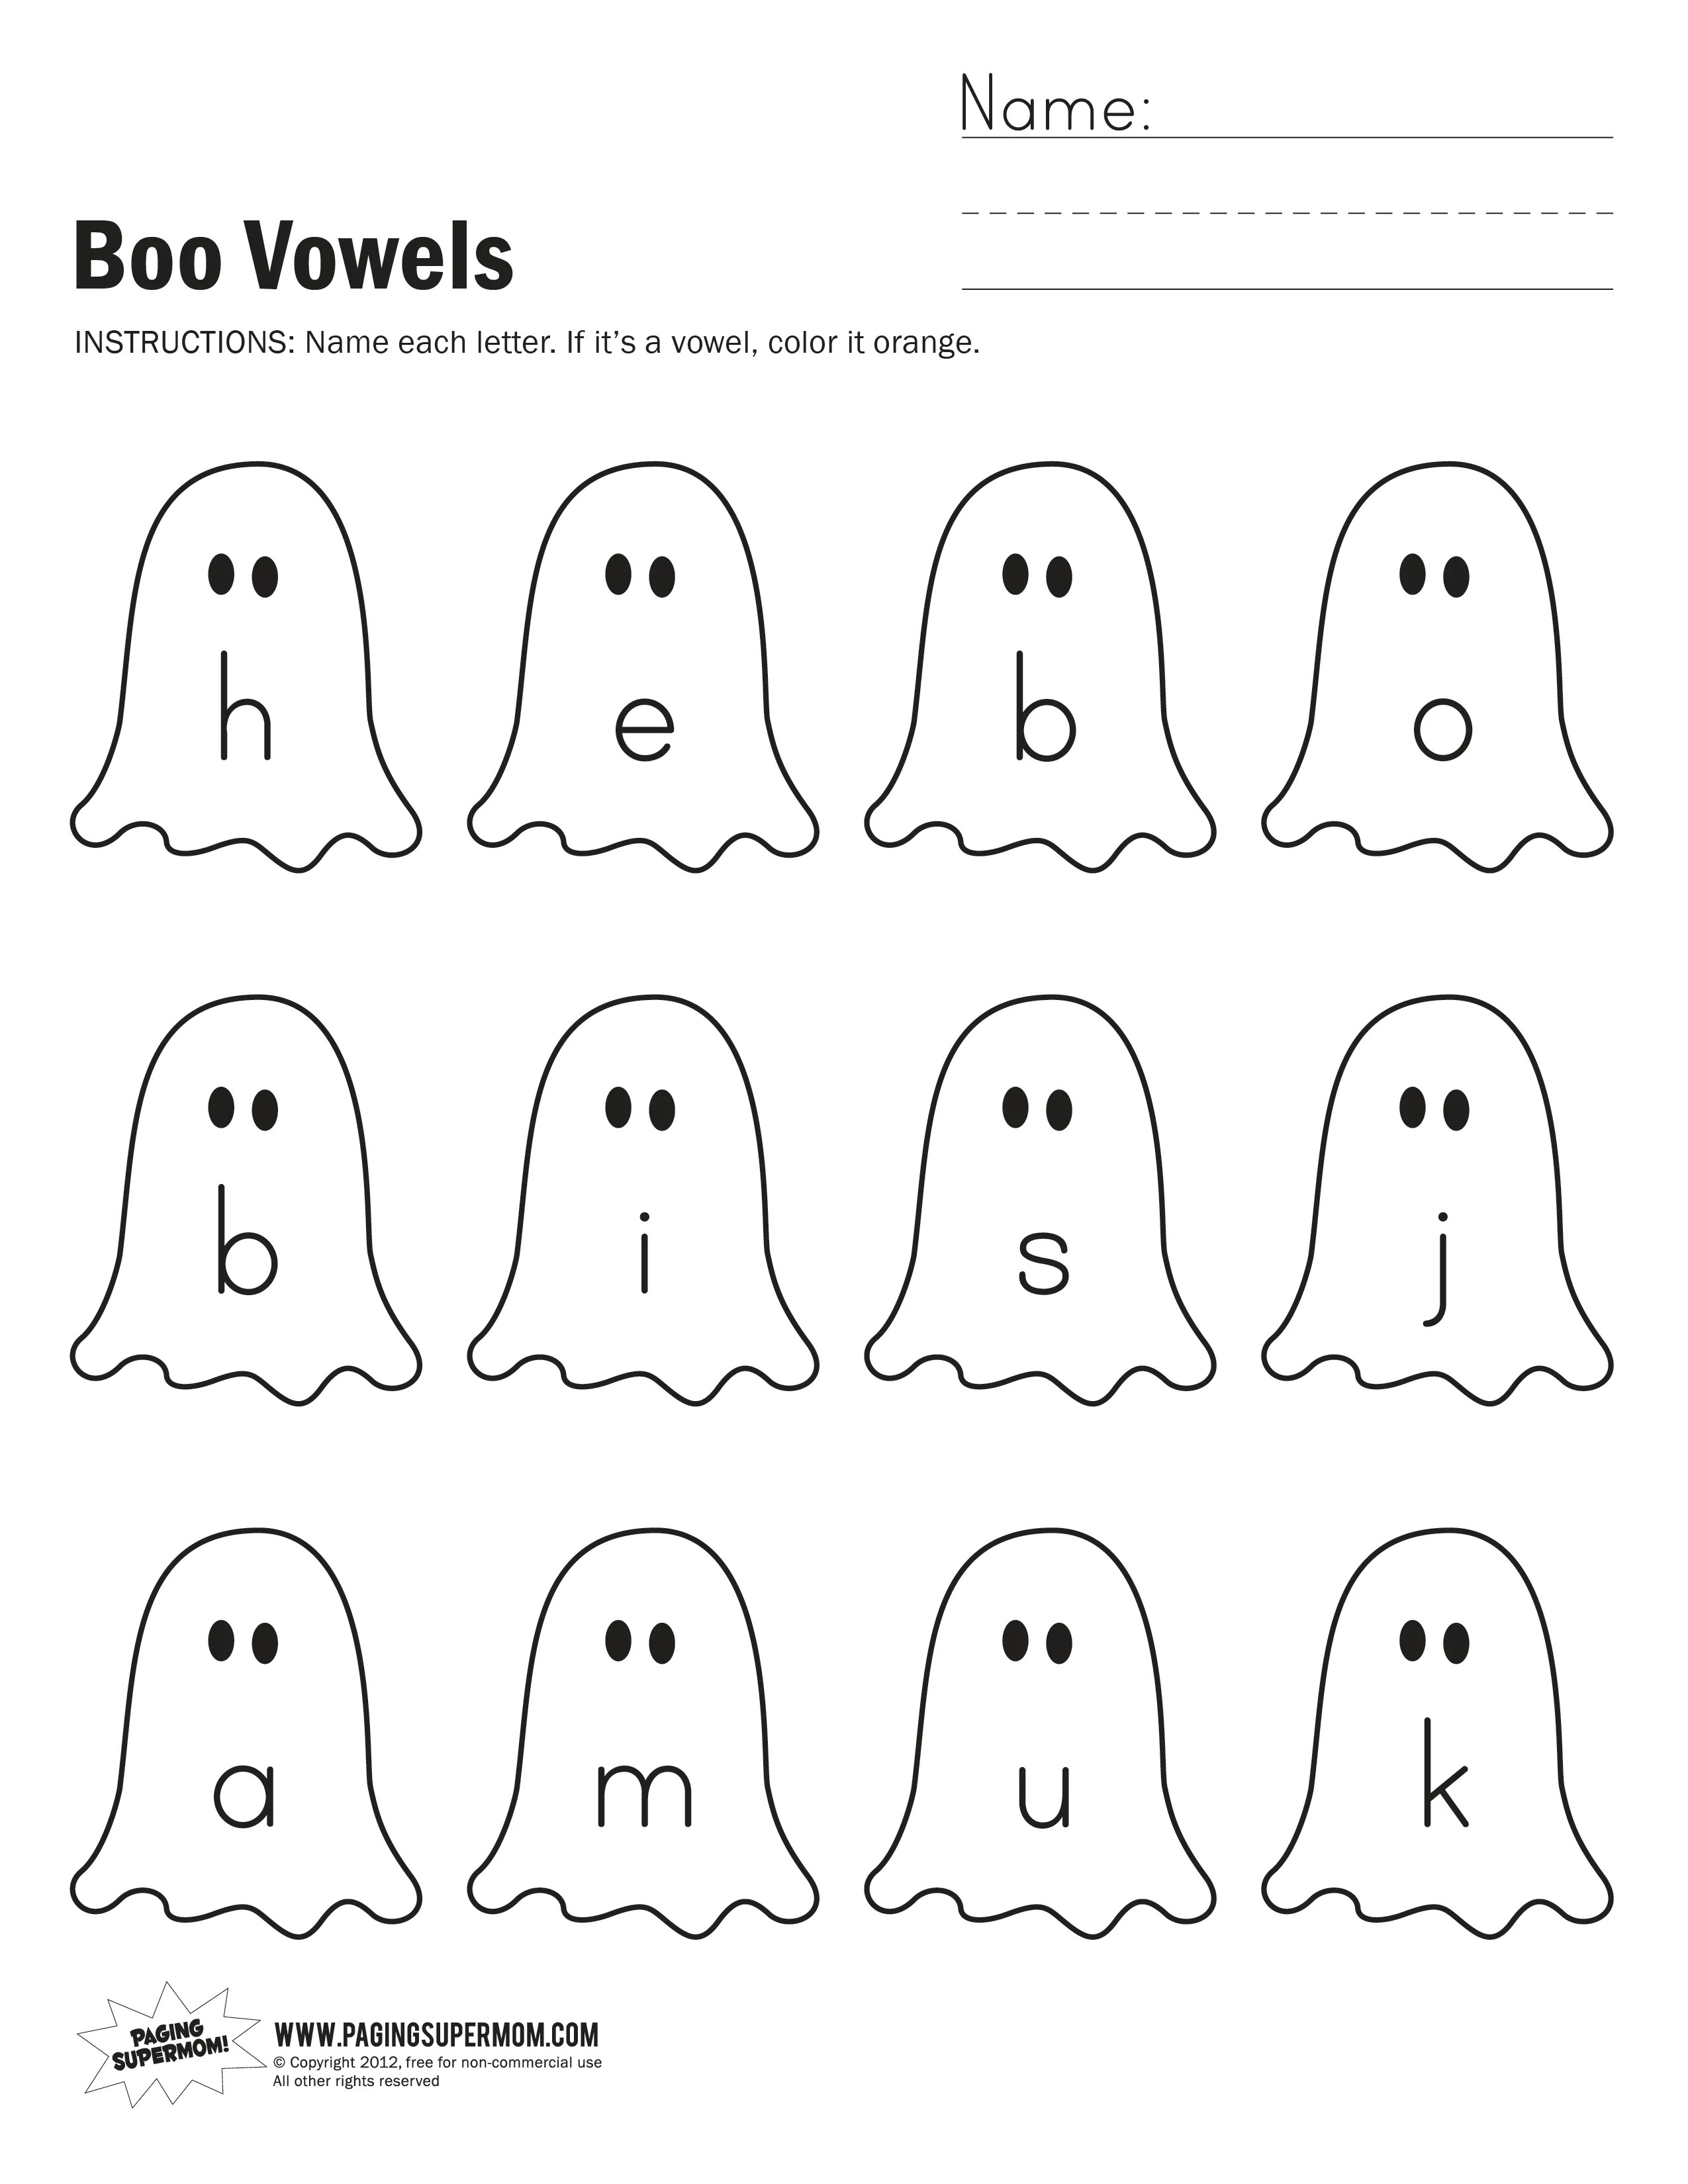 Boo Vowels Worksheet